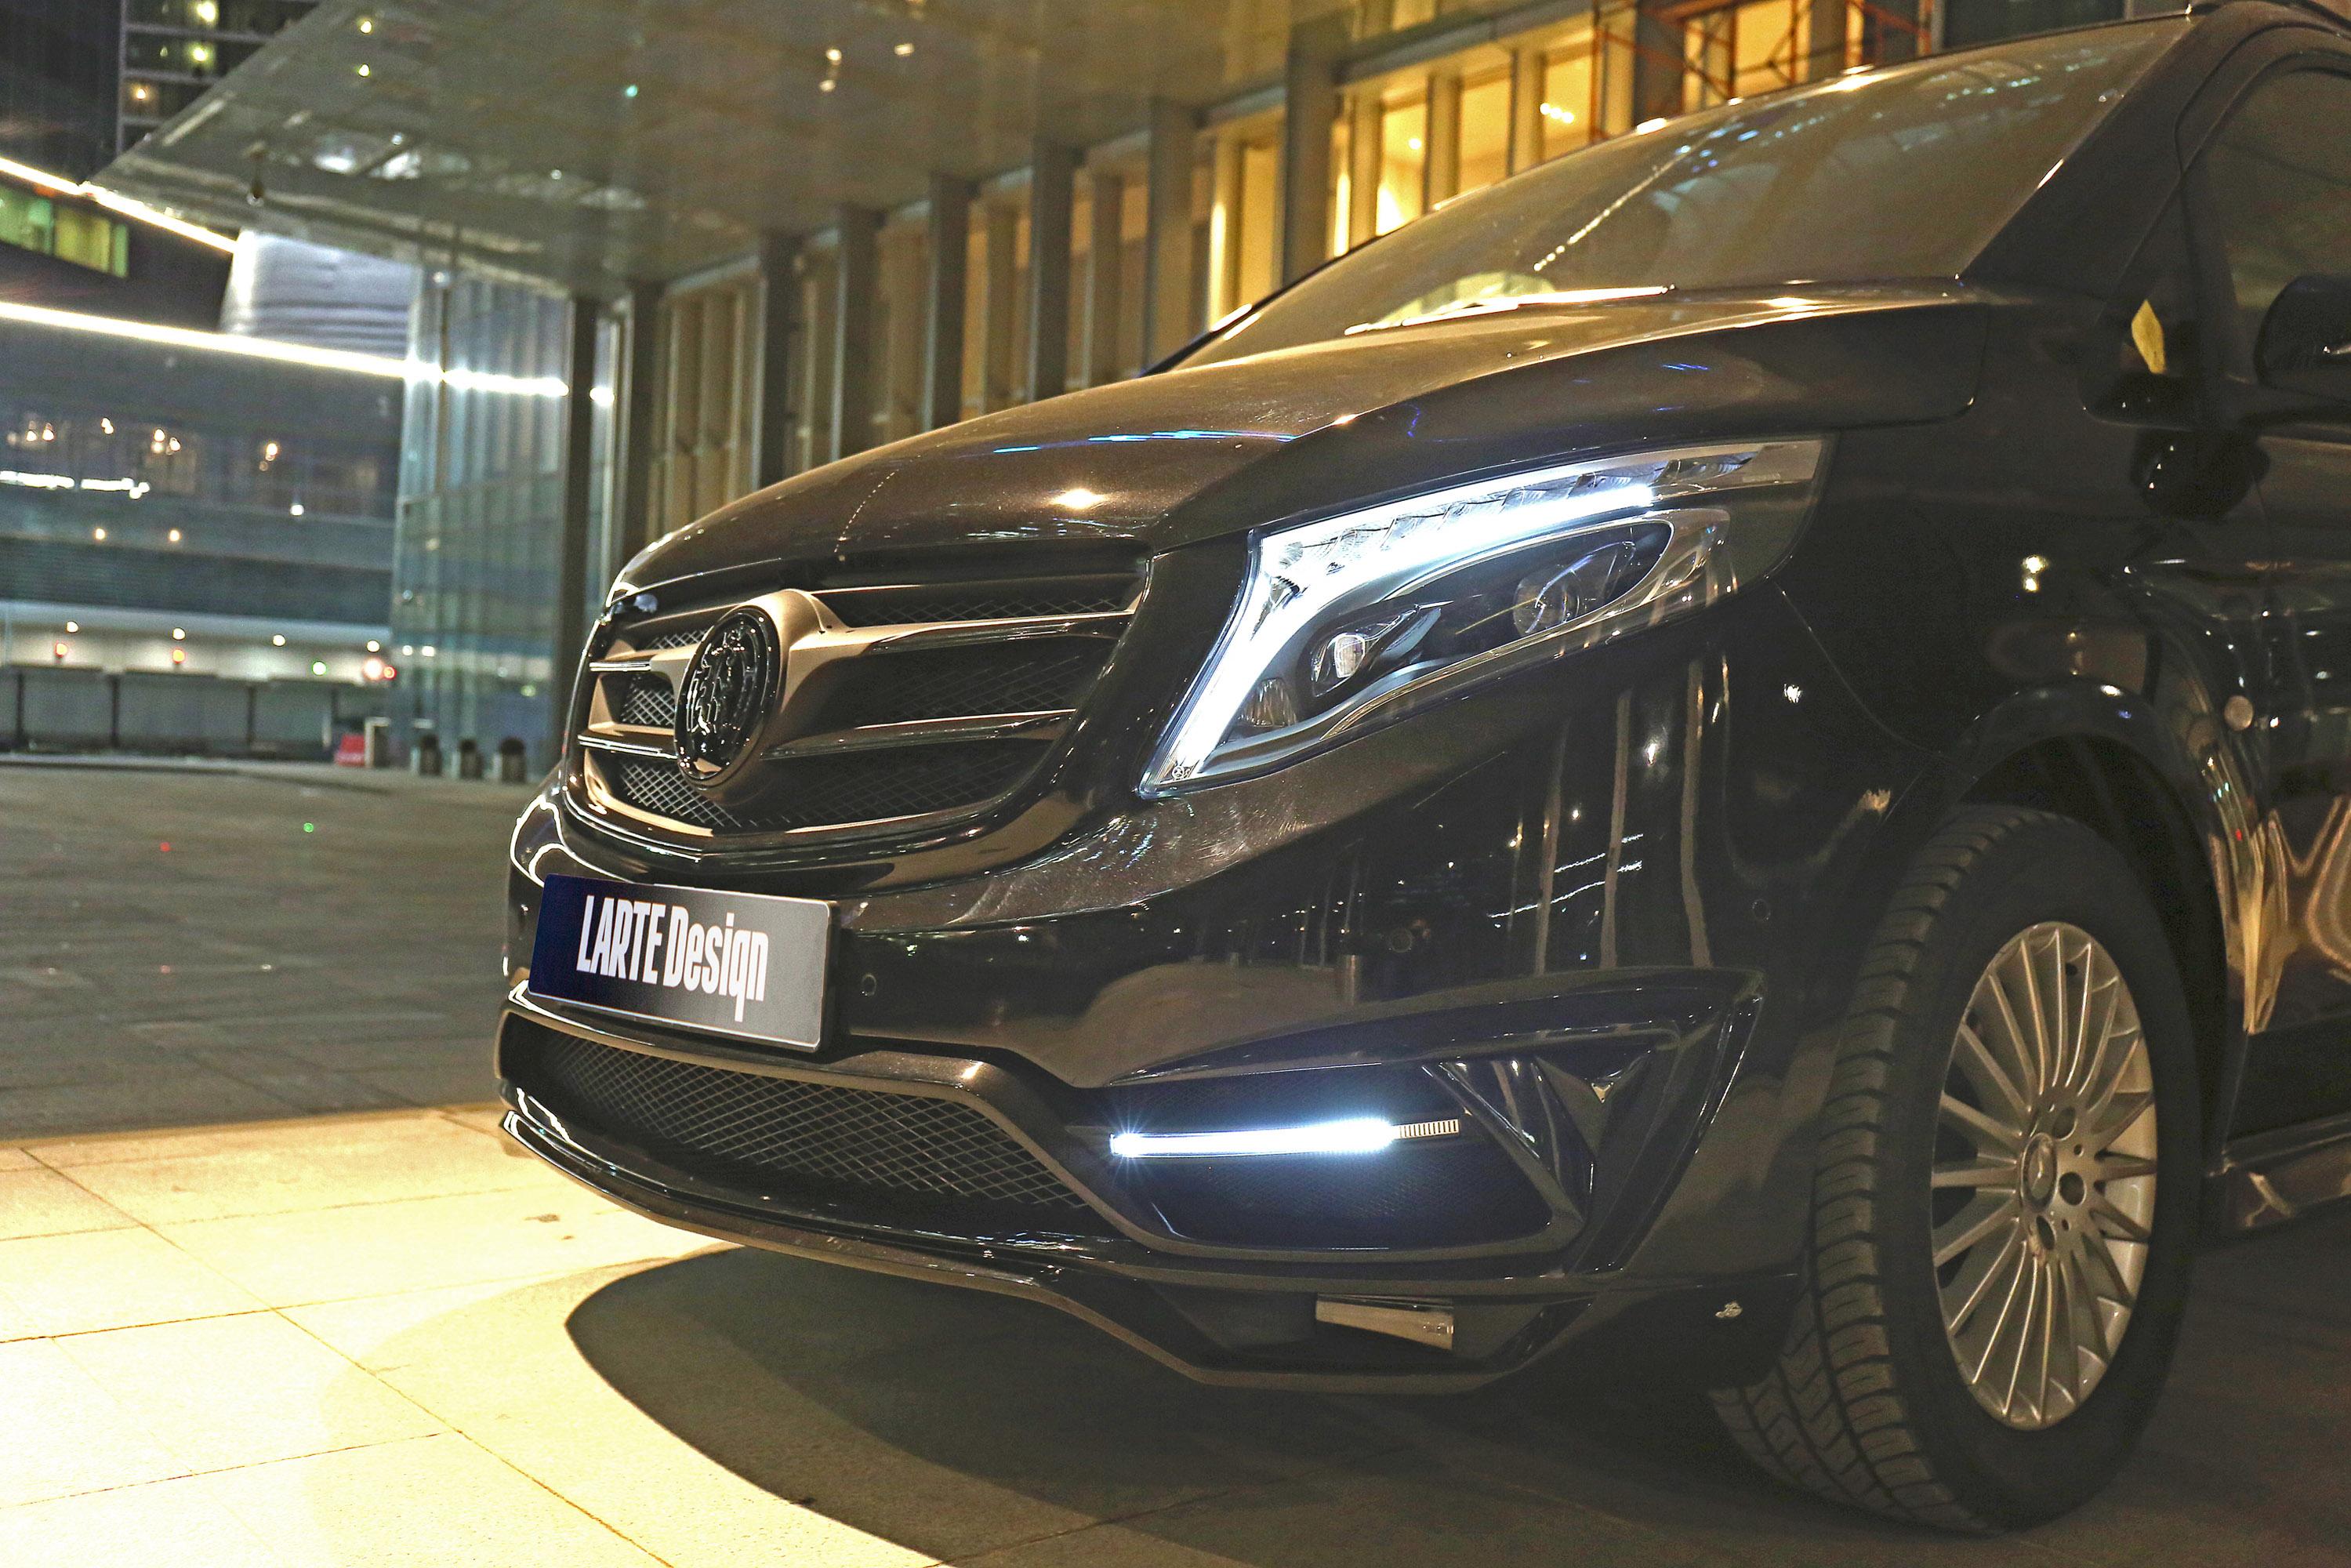 ... 2016 Larte Design Mercedes Benz V Class Black Crystal , 15 Of 21 ...